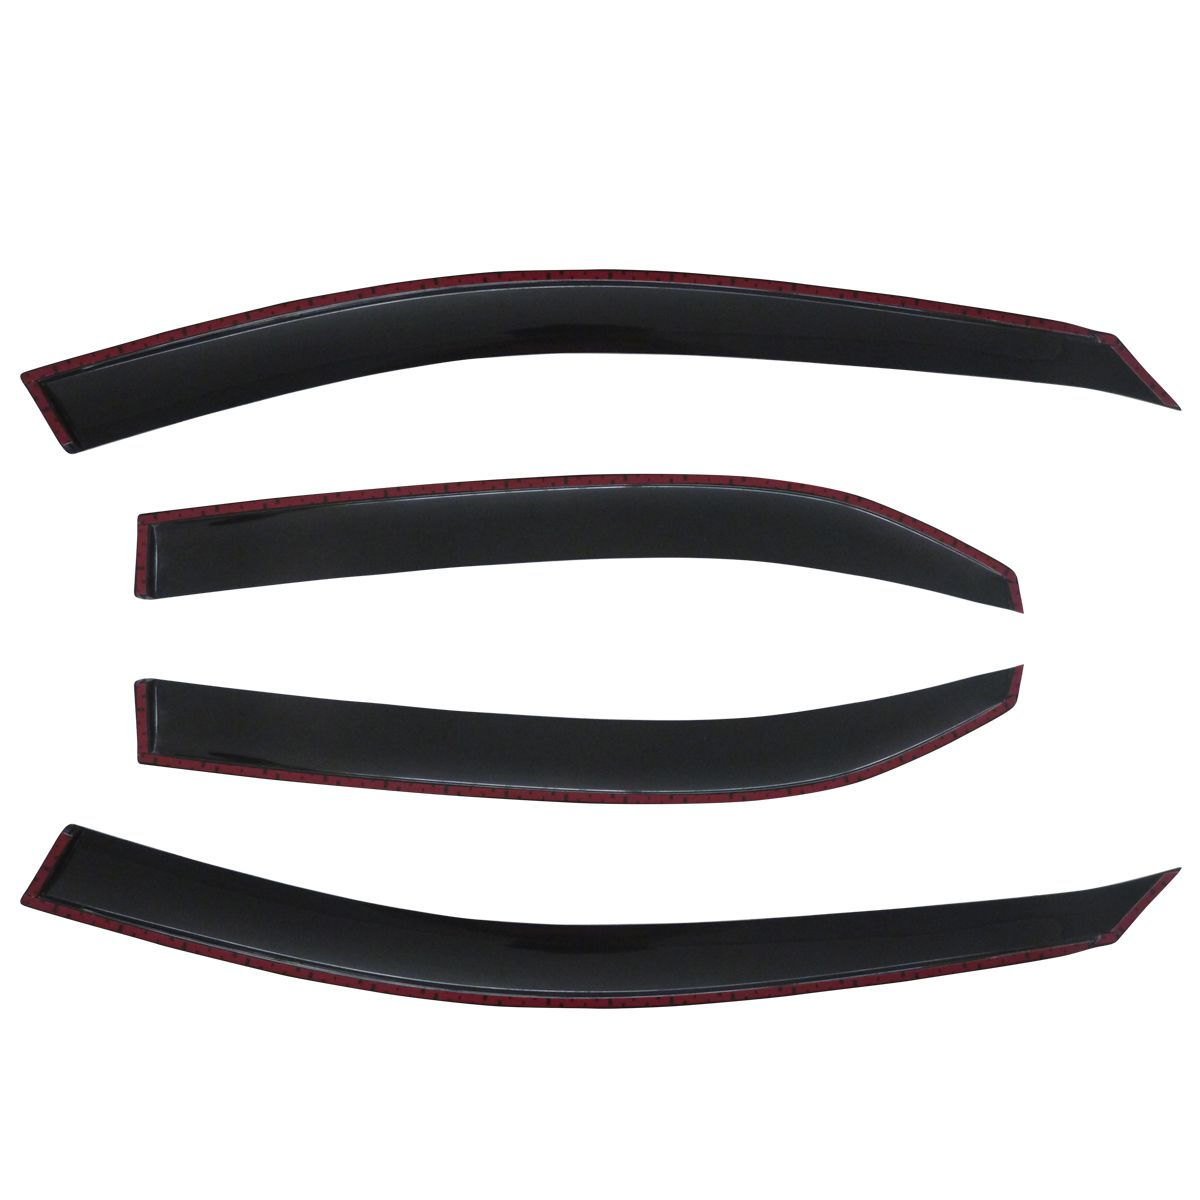 Calha Defletor Chuva Onix Hatch 2020 - 4 portas